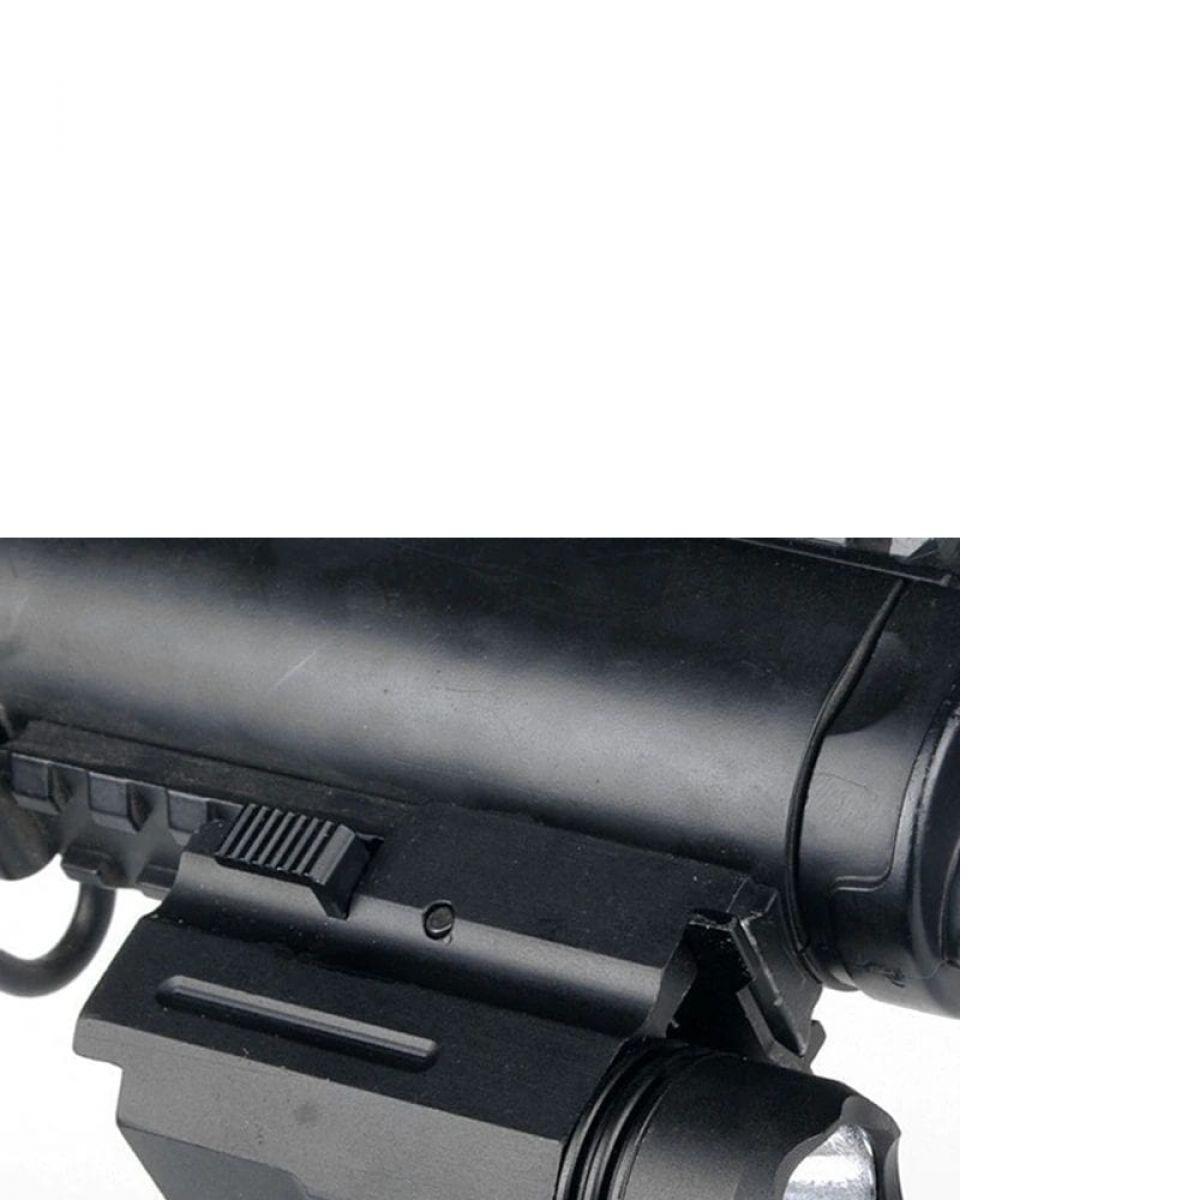 laser sight metal airsoft rail attach